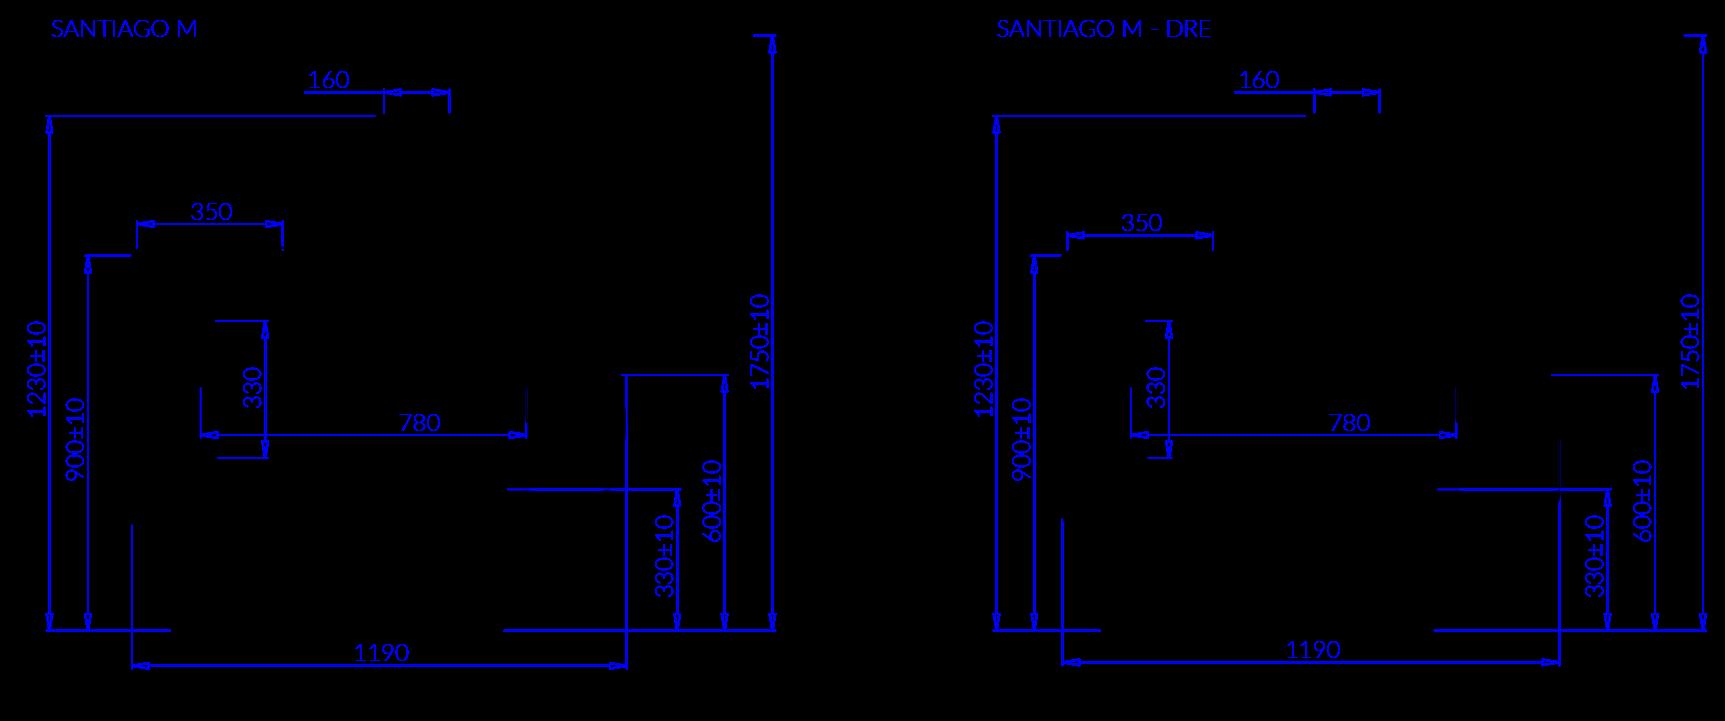 Technical drawing SANTIAGO M